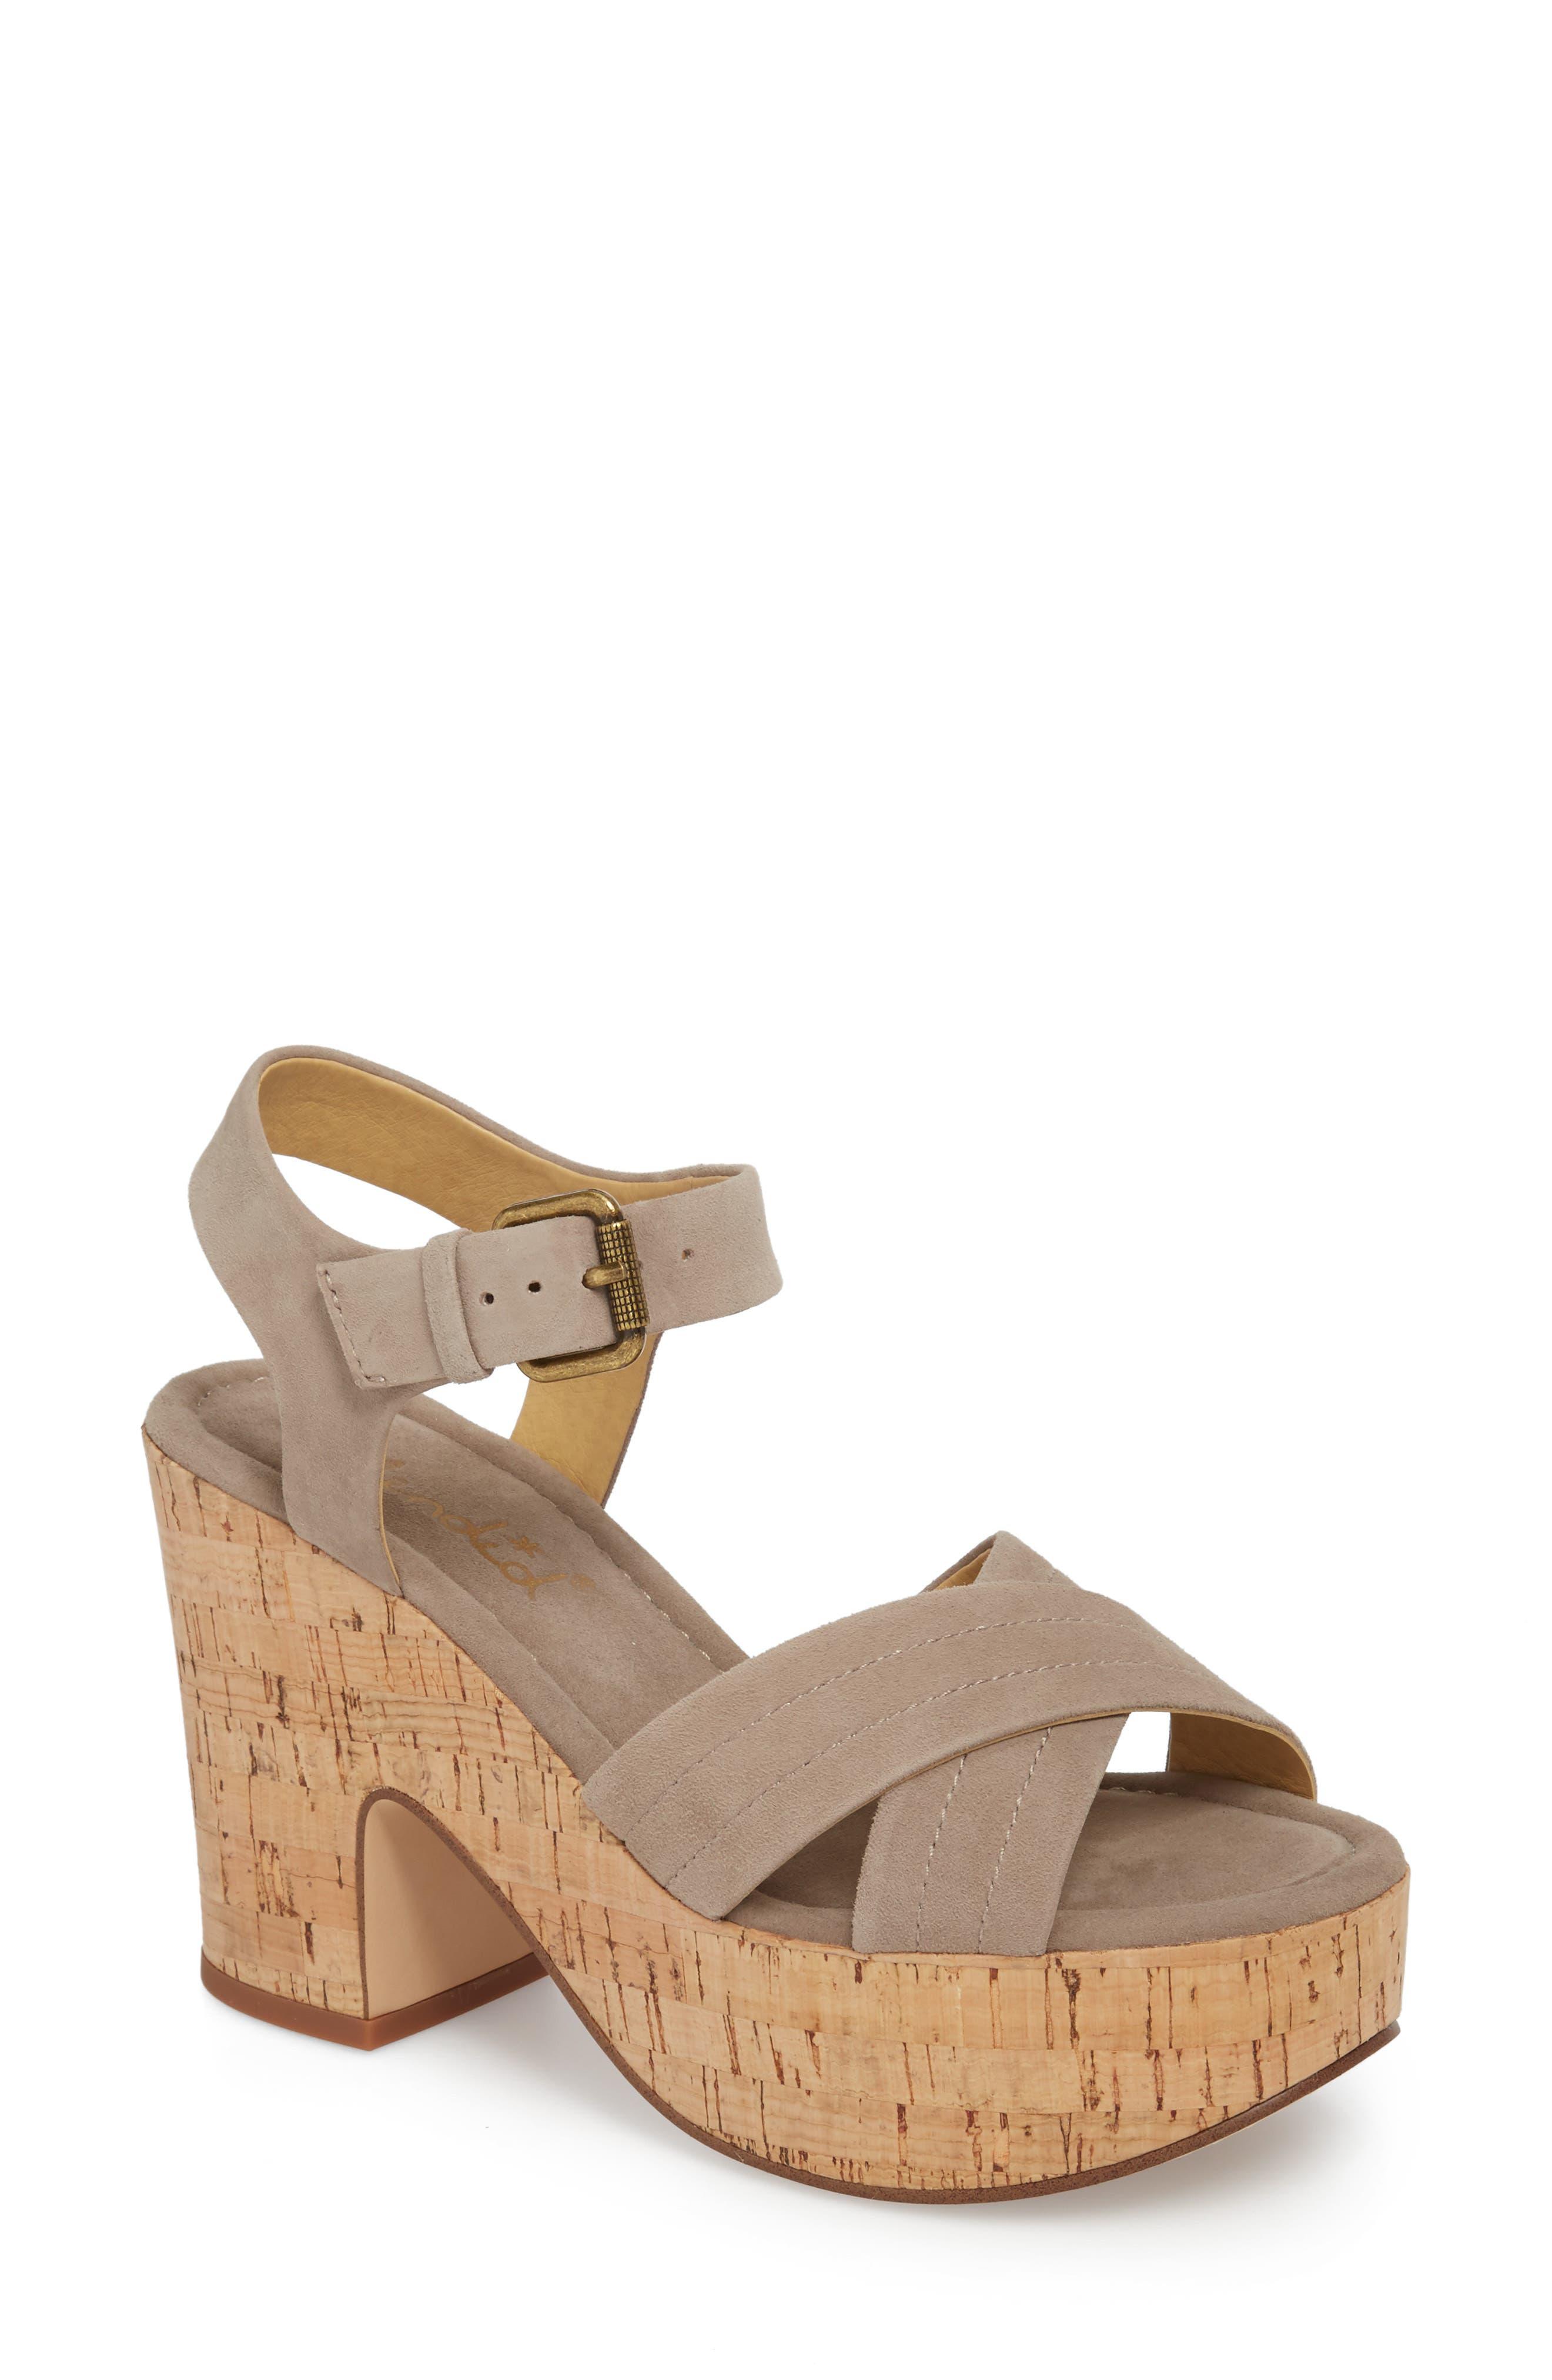 Splendid Flaire Platform Sandal- Beige